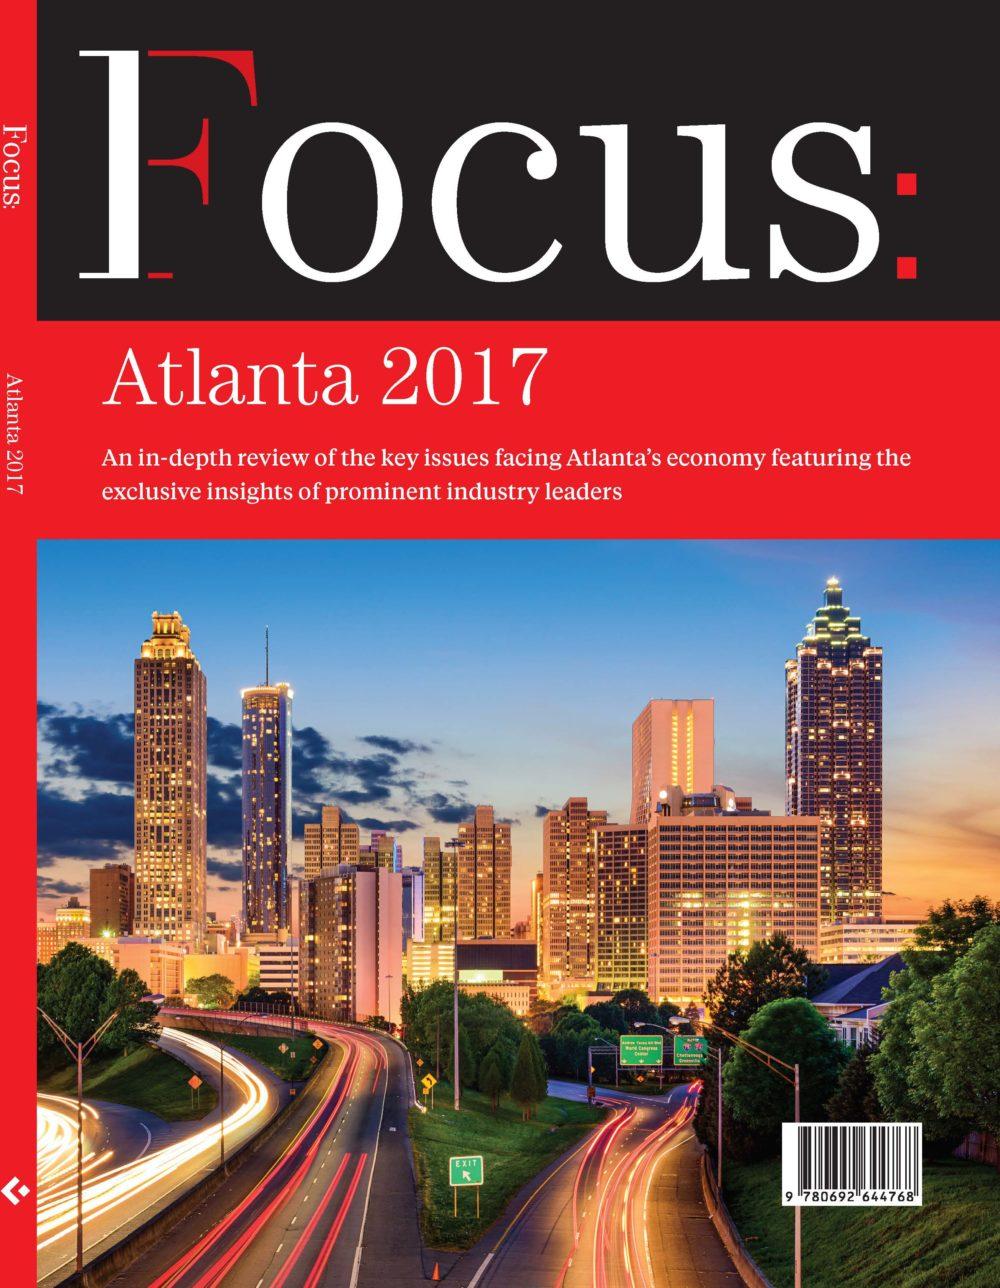 Focus: Atlanta